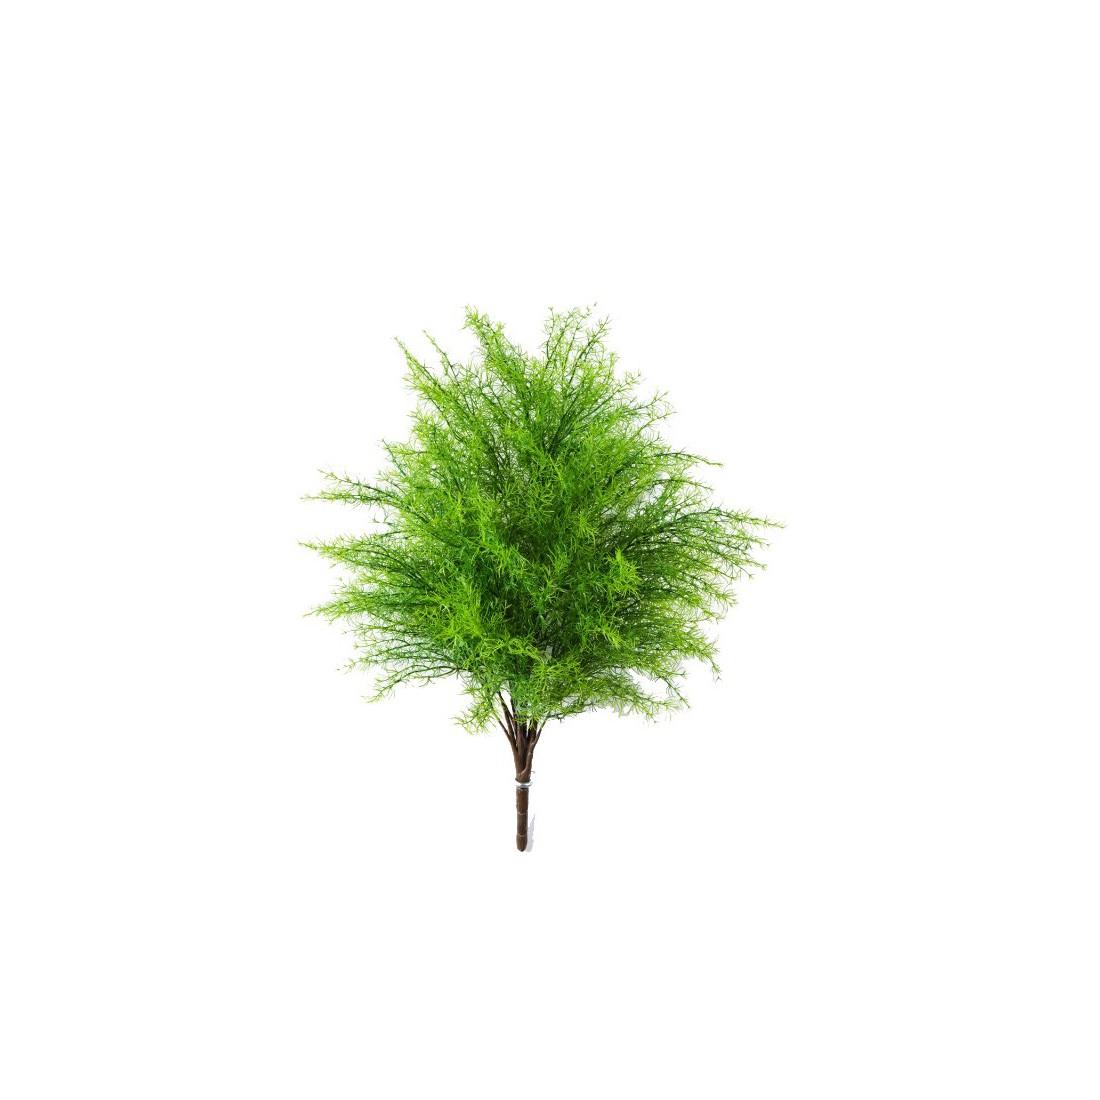 Sprengiri artificiel 80cm plantes artificielles plantes for Plantes artificielles lyon